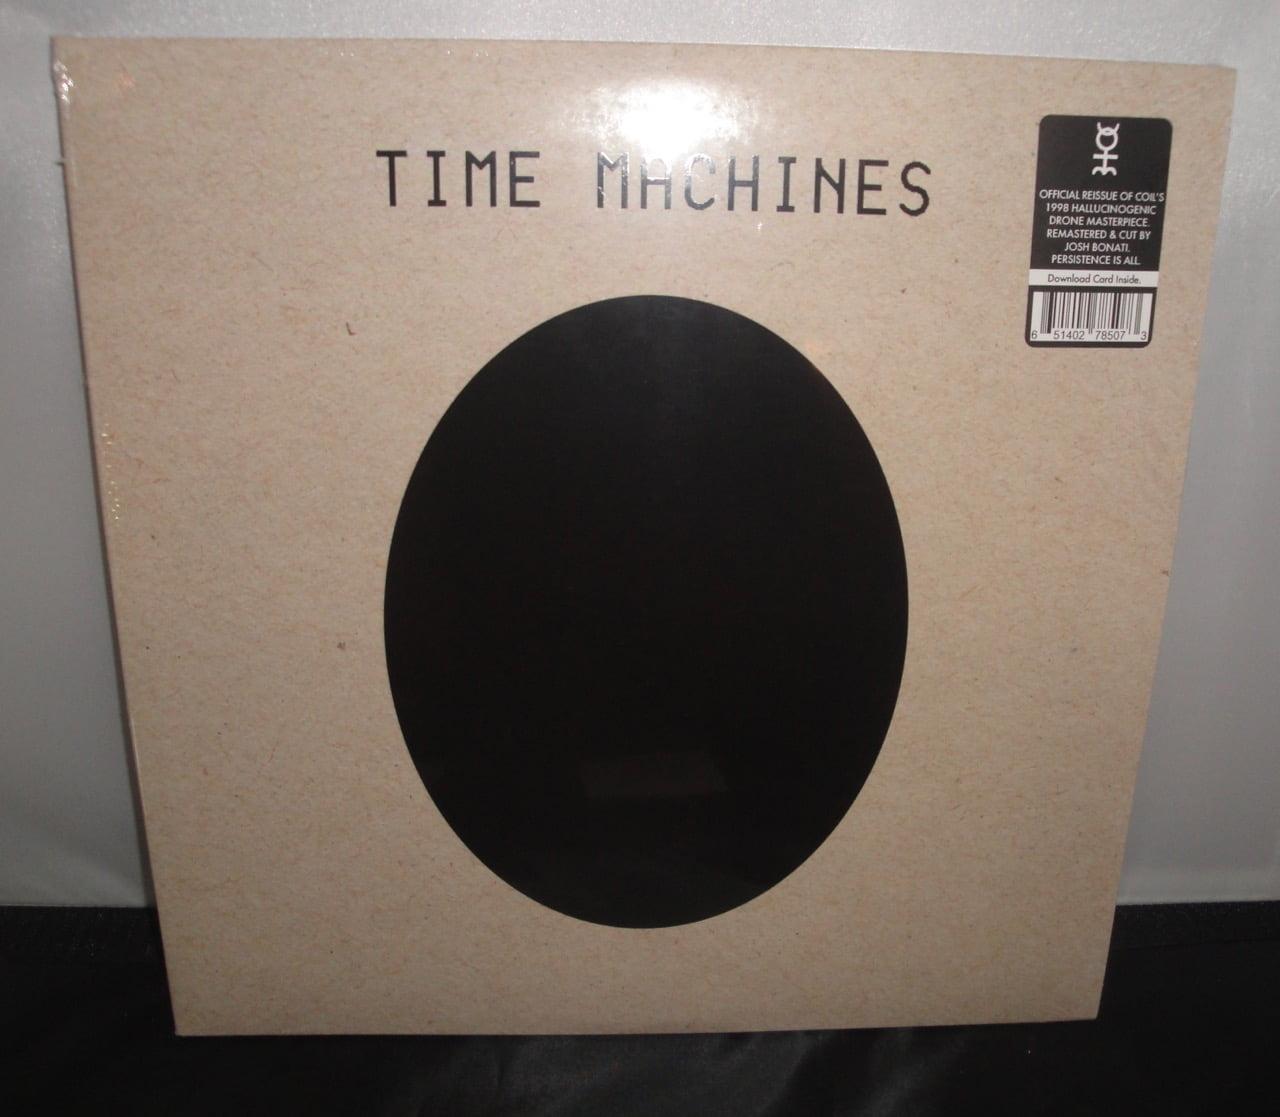 Coil - Time Machines - 2XLP, Remastered Reissue, Dais, 2017